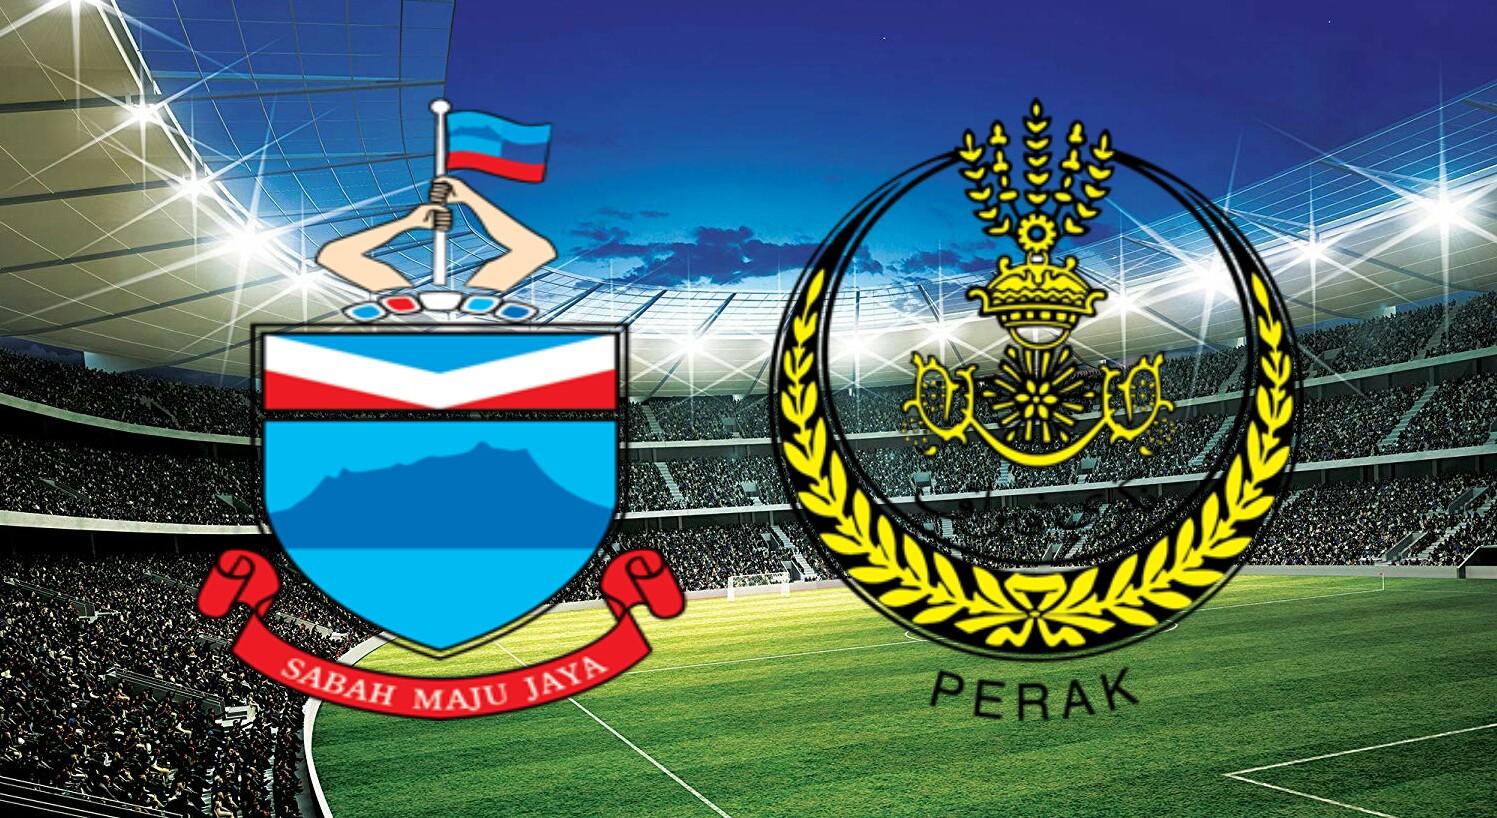 Live Streaming Sabah vs Perak 21.10.2018 Unifi Piala Malaysia